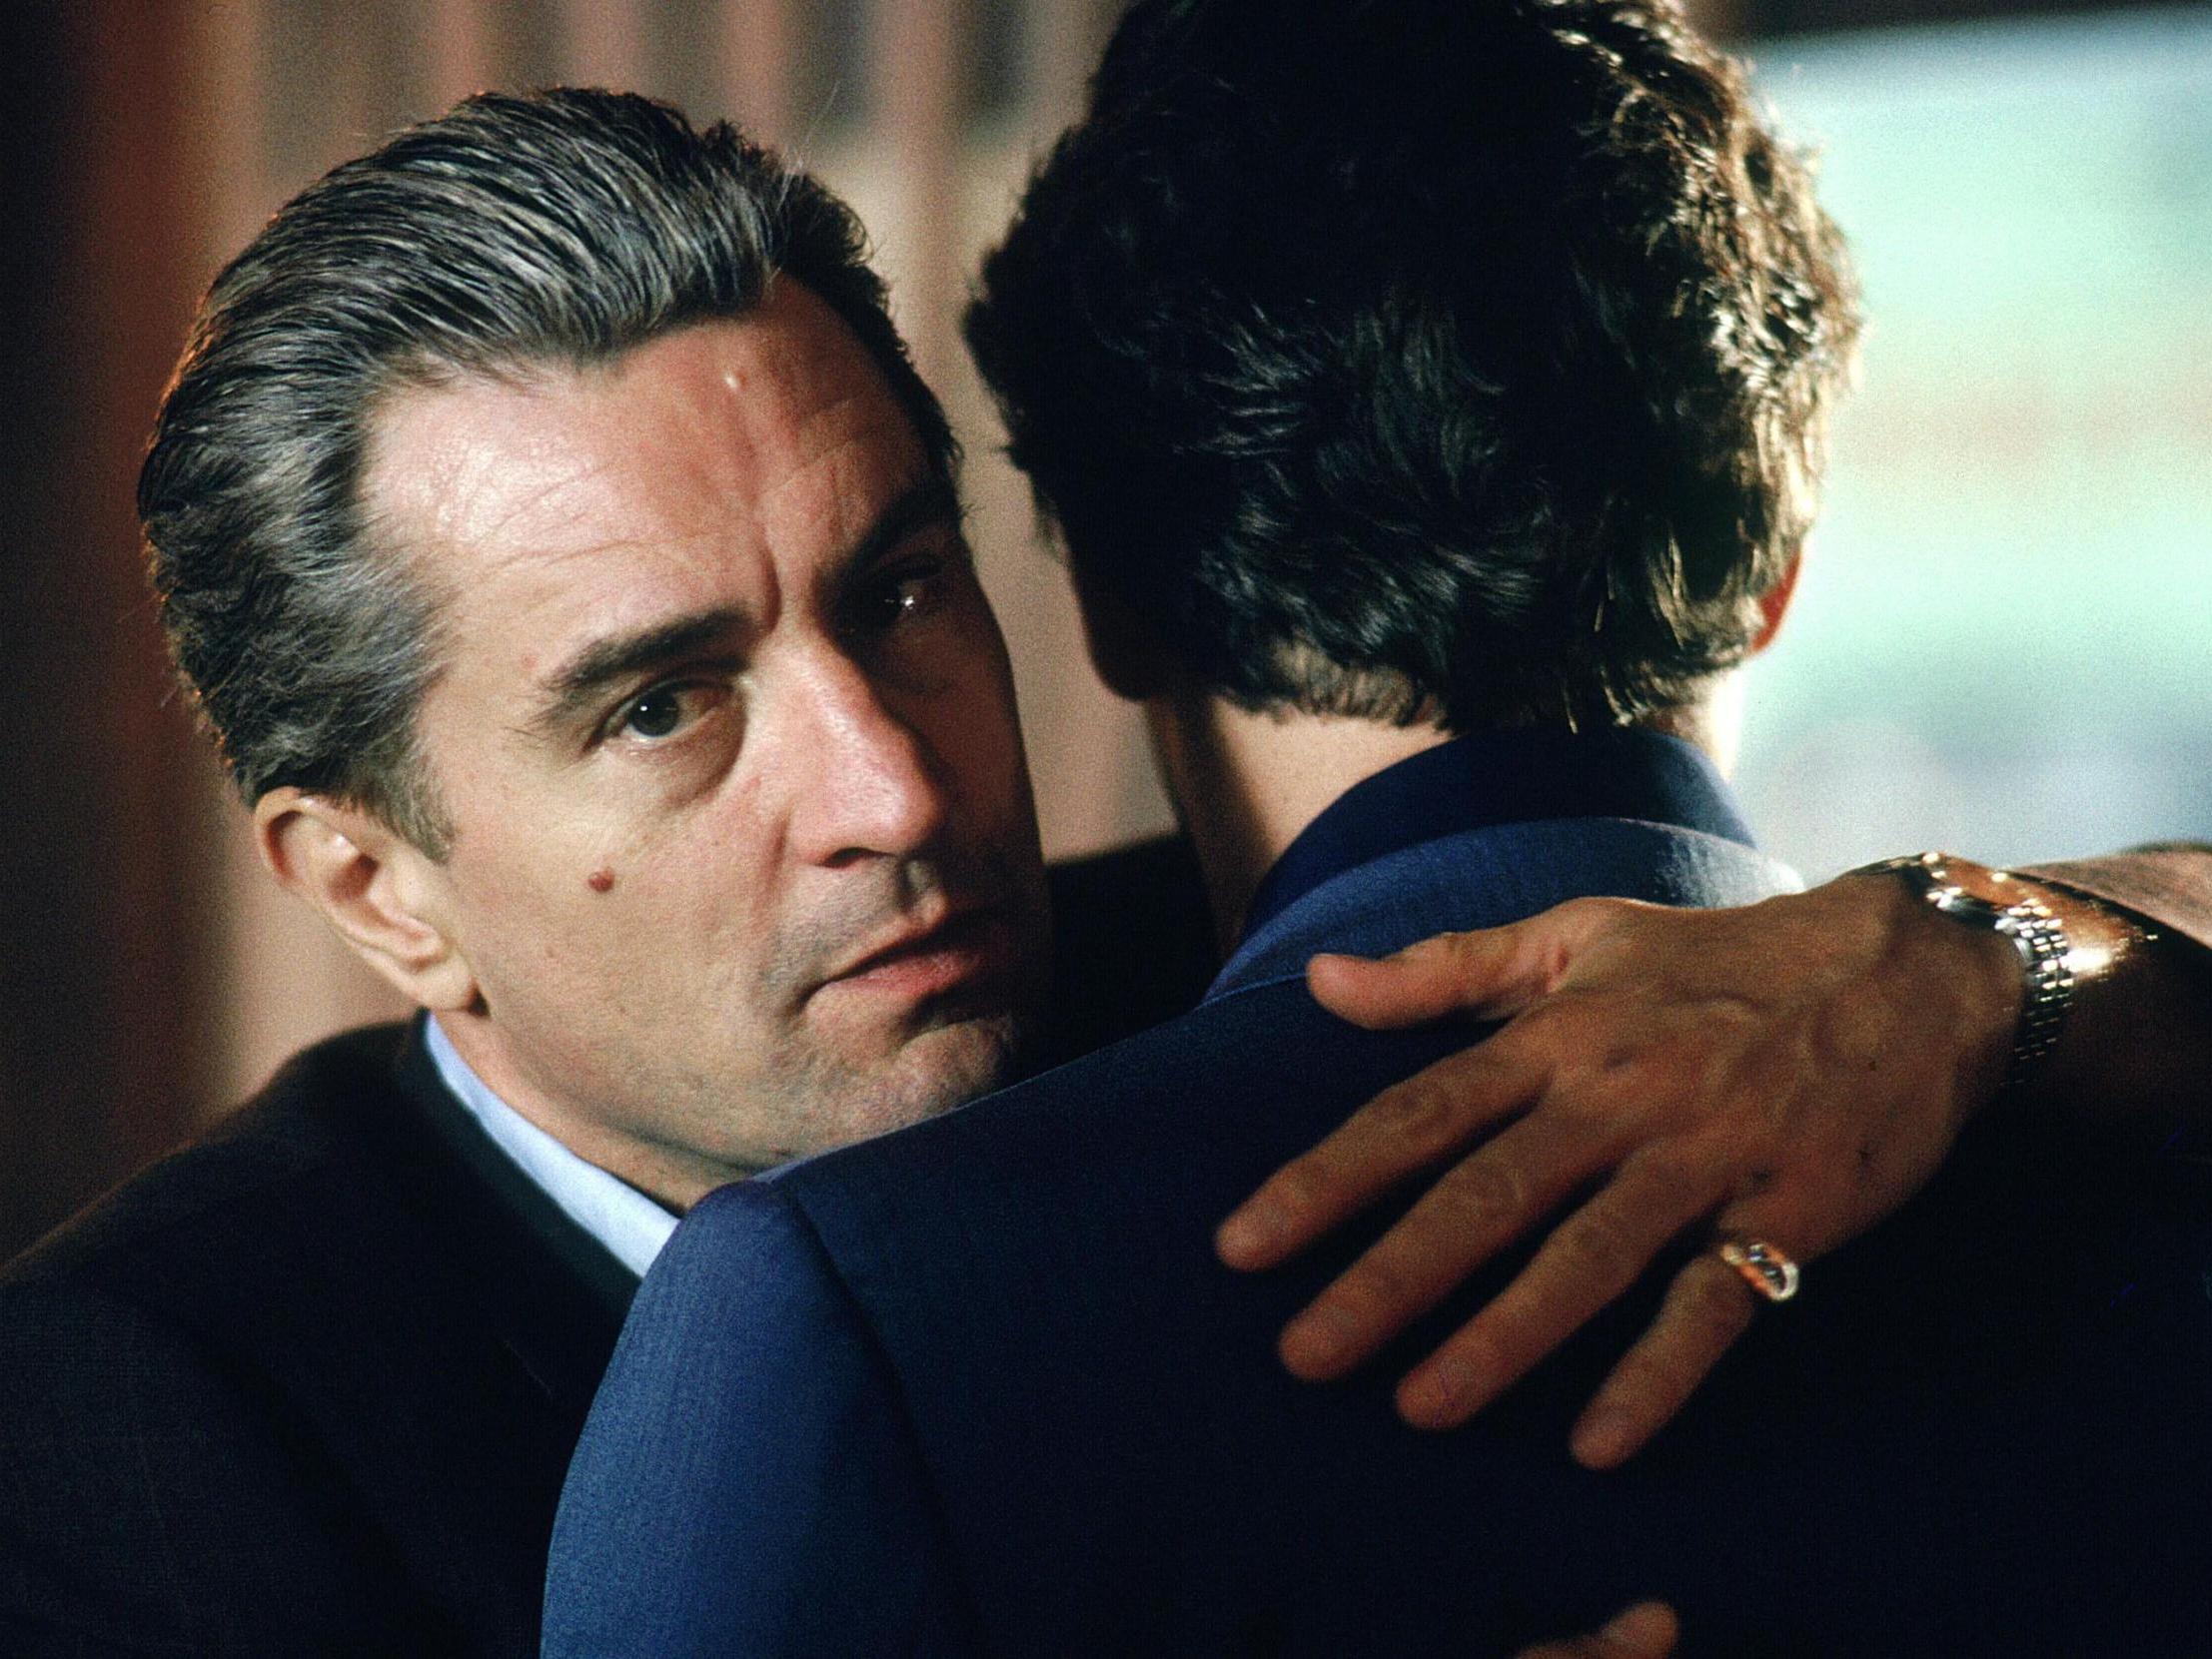 Robert De Niro recreated classic Goodfellas scene for The Irishman